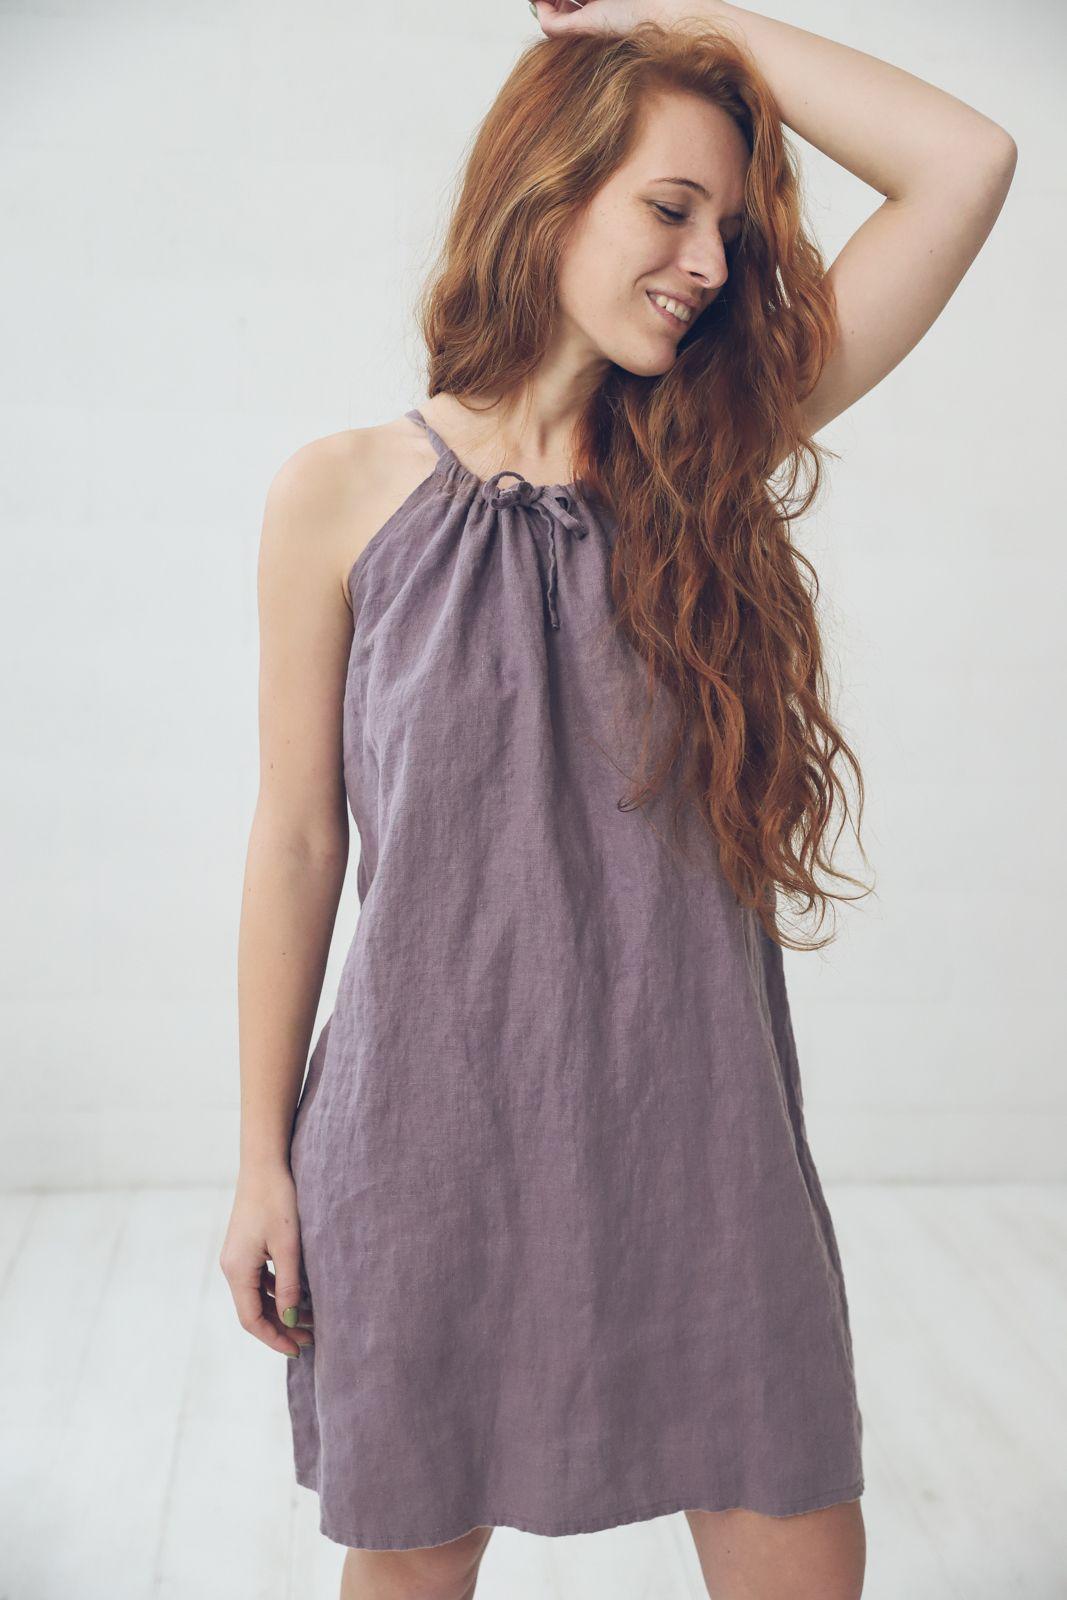 Linen Summer Dress In Violet Ash Linen Slip Dress Etsy Linen Slip Dress Summer Linen Dresses Summer Dresses [ 1600 x 1067 Pixel ]